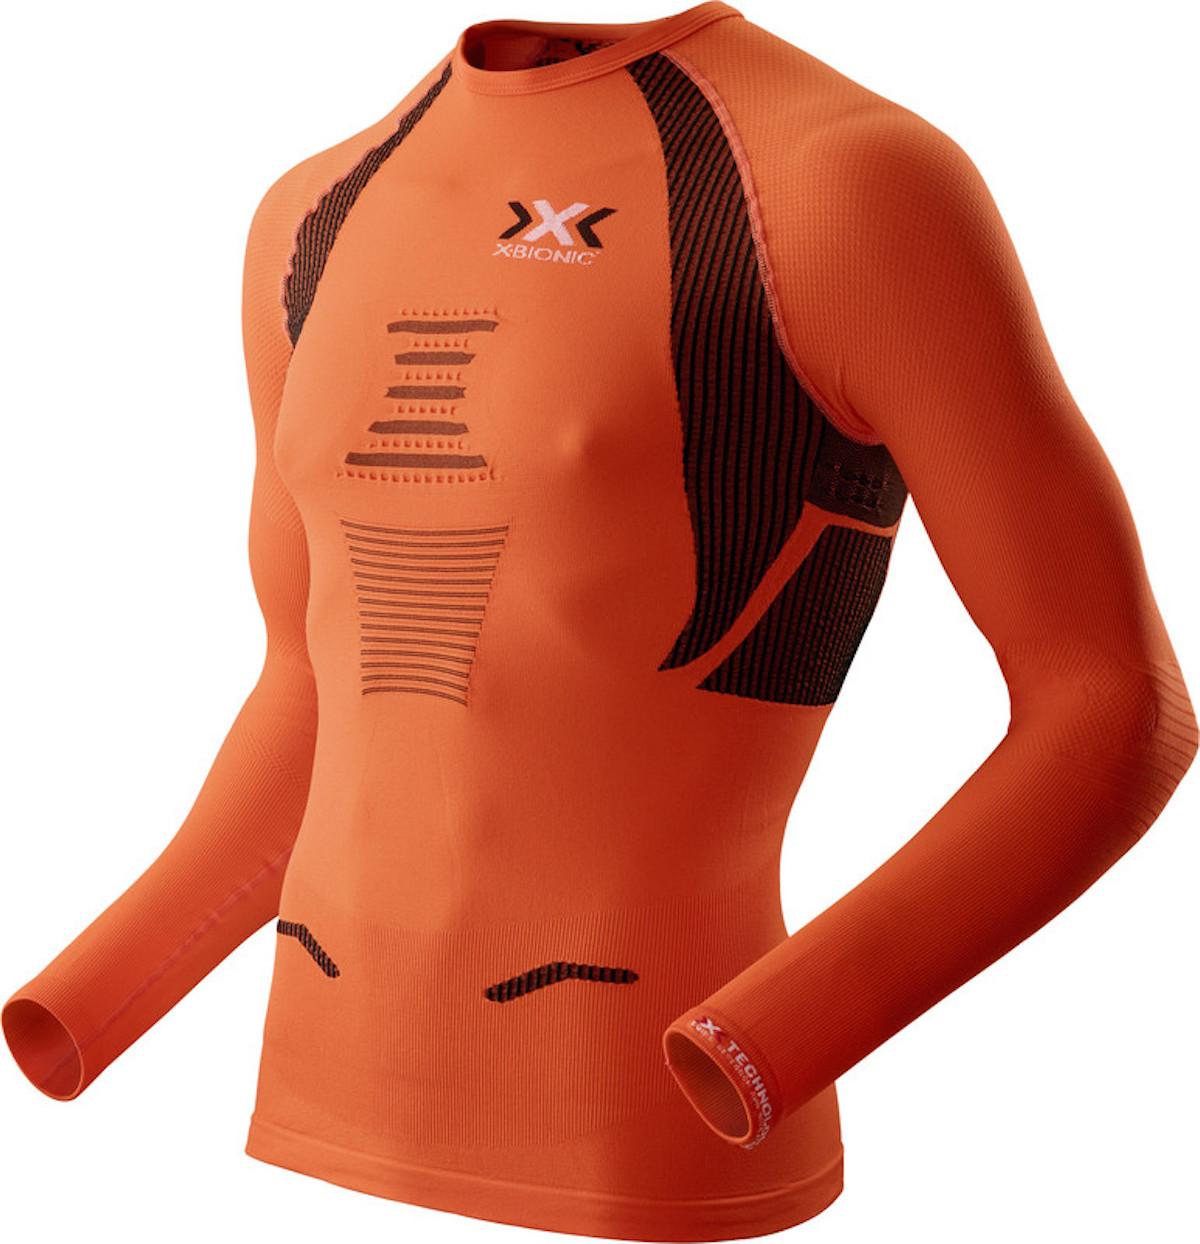 X-Bionic - Running The Trick - Camiseta técnica - Hombre